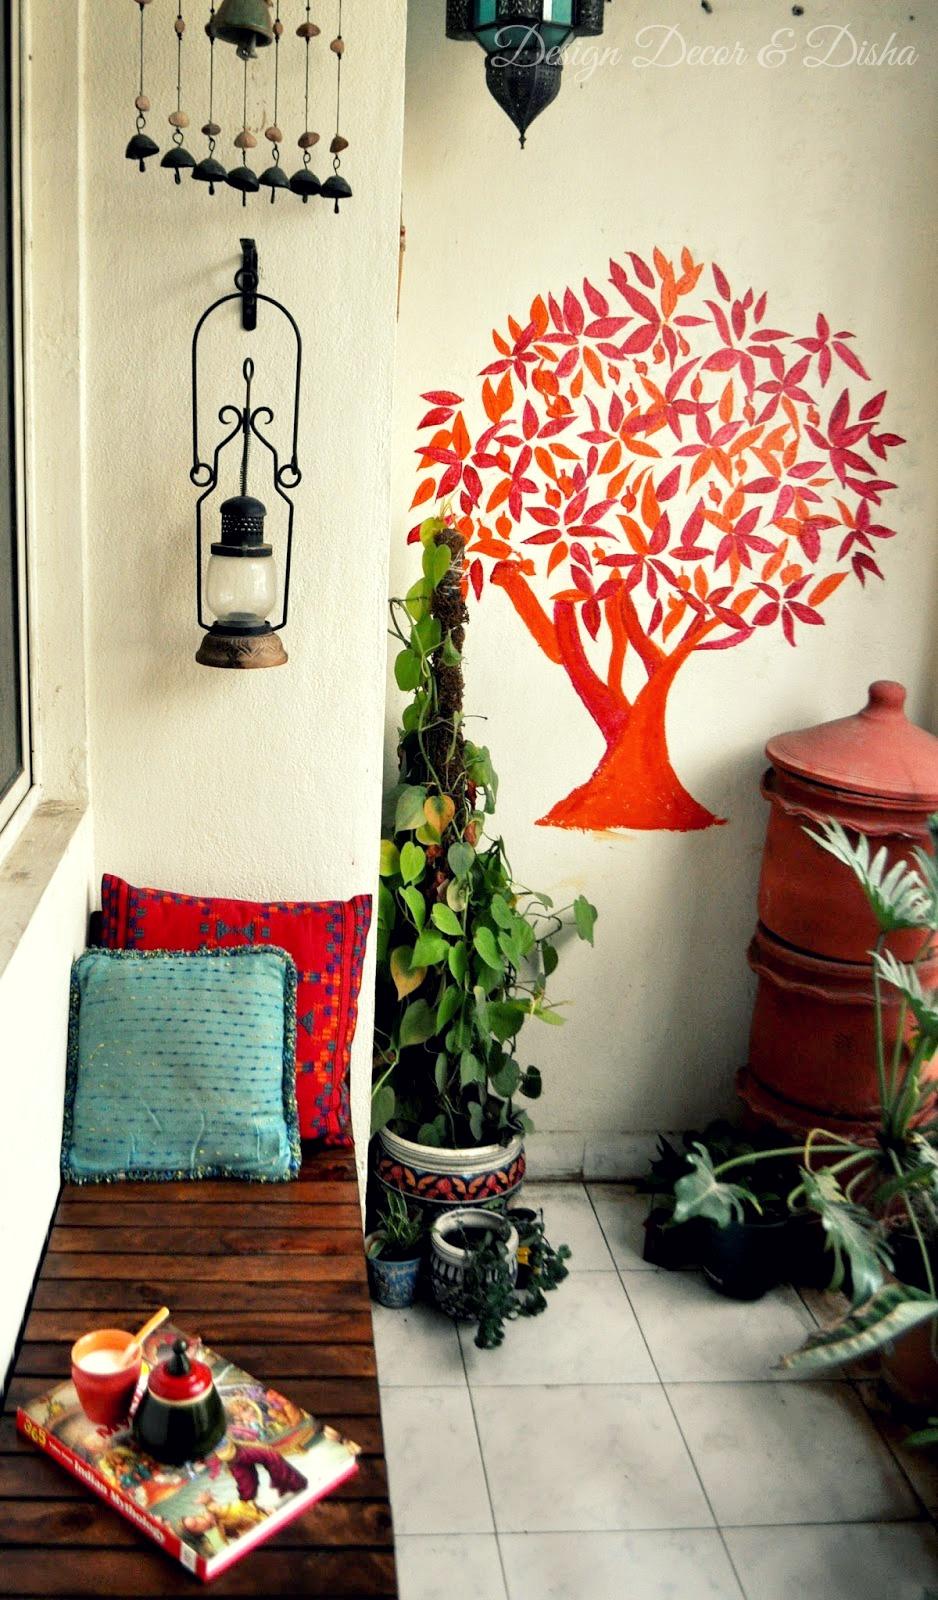 Design Decor & Disha | An Indian Design & Decor Blog: Home ...